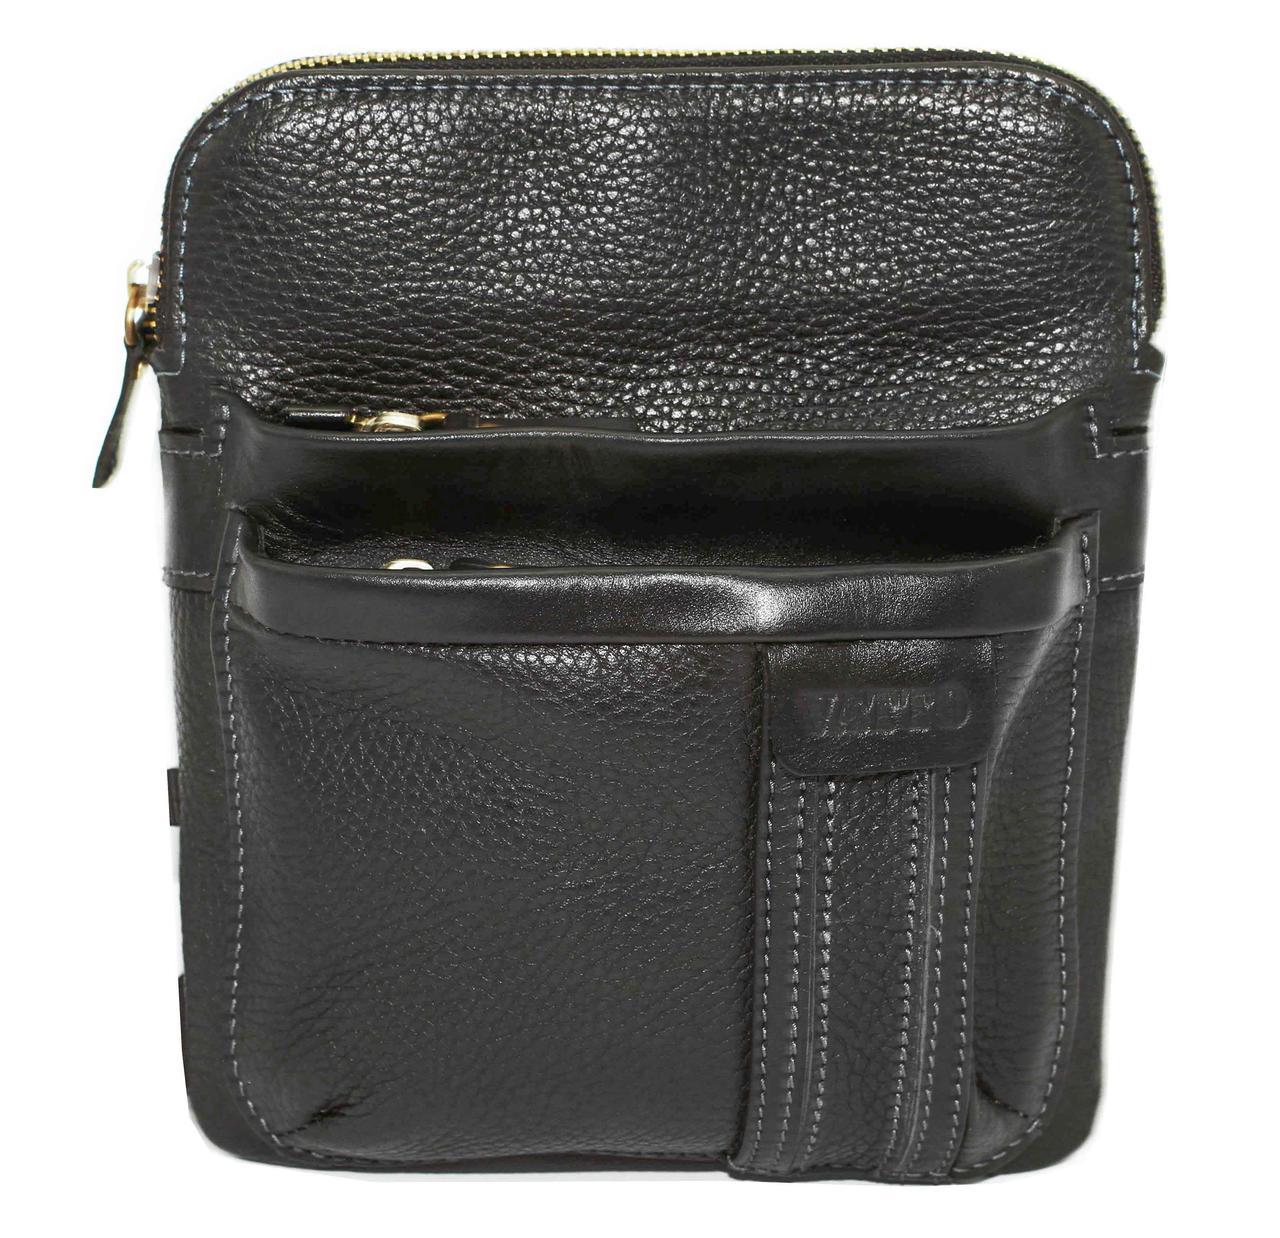 Мужская сумка VATTO Mk54 F8Kаz1